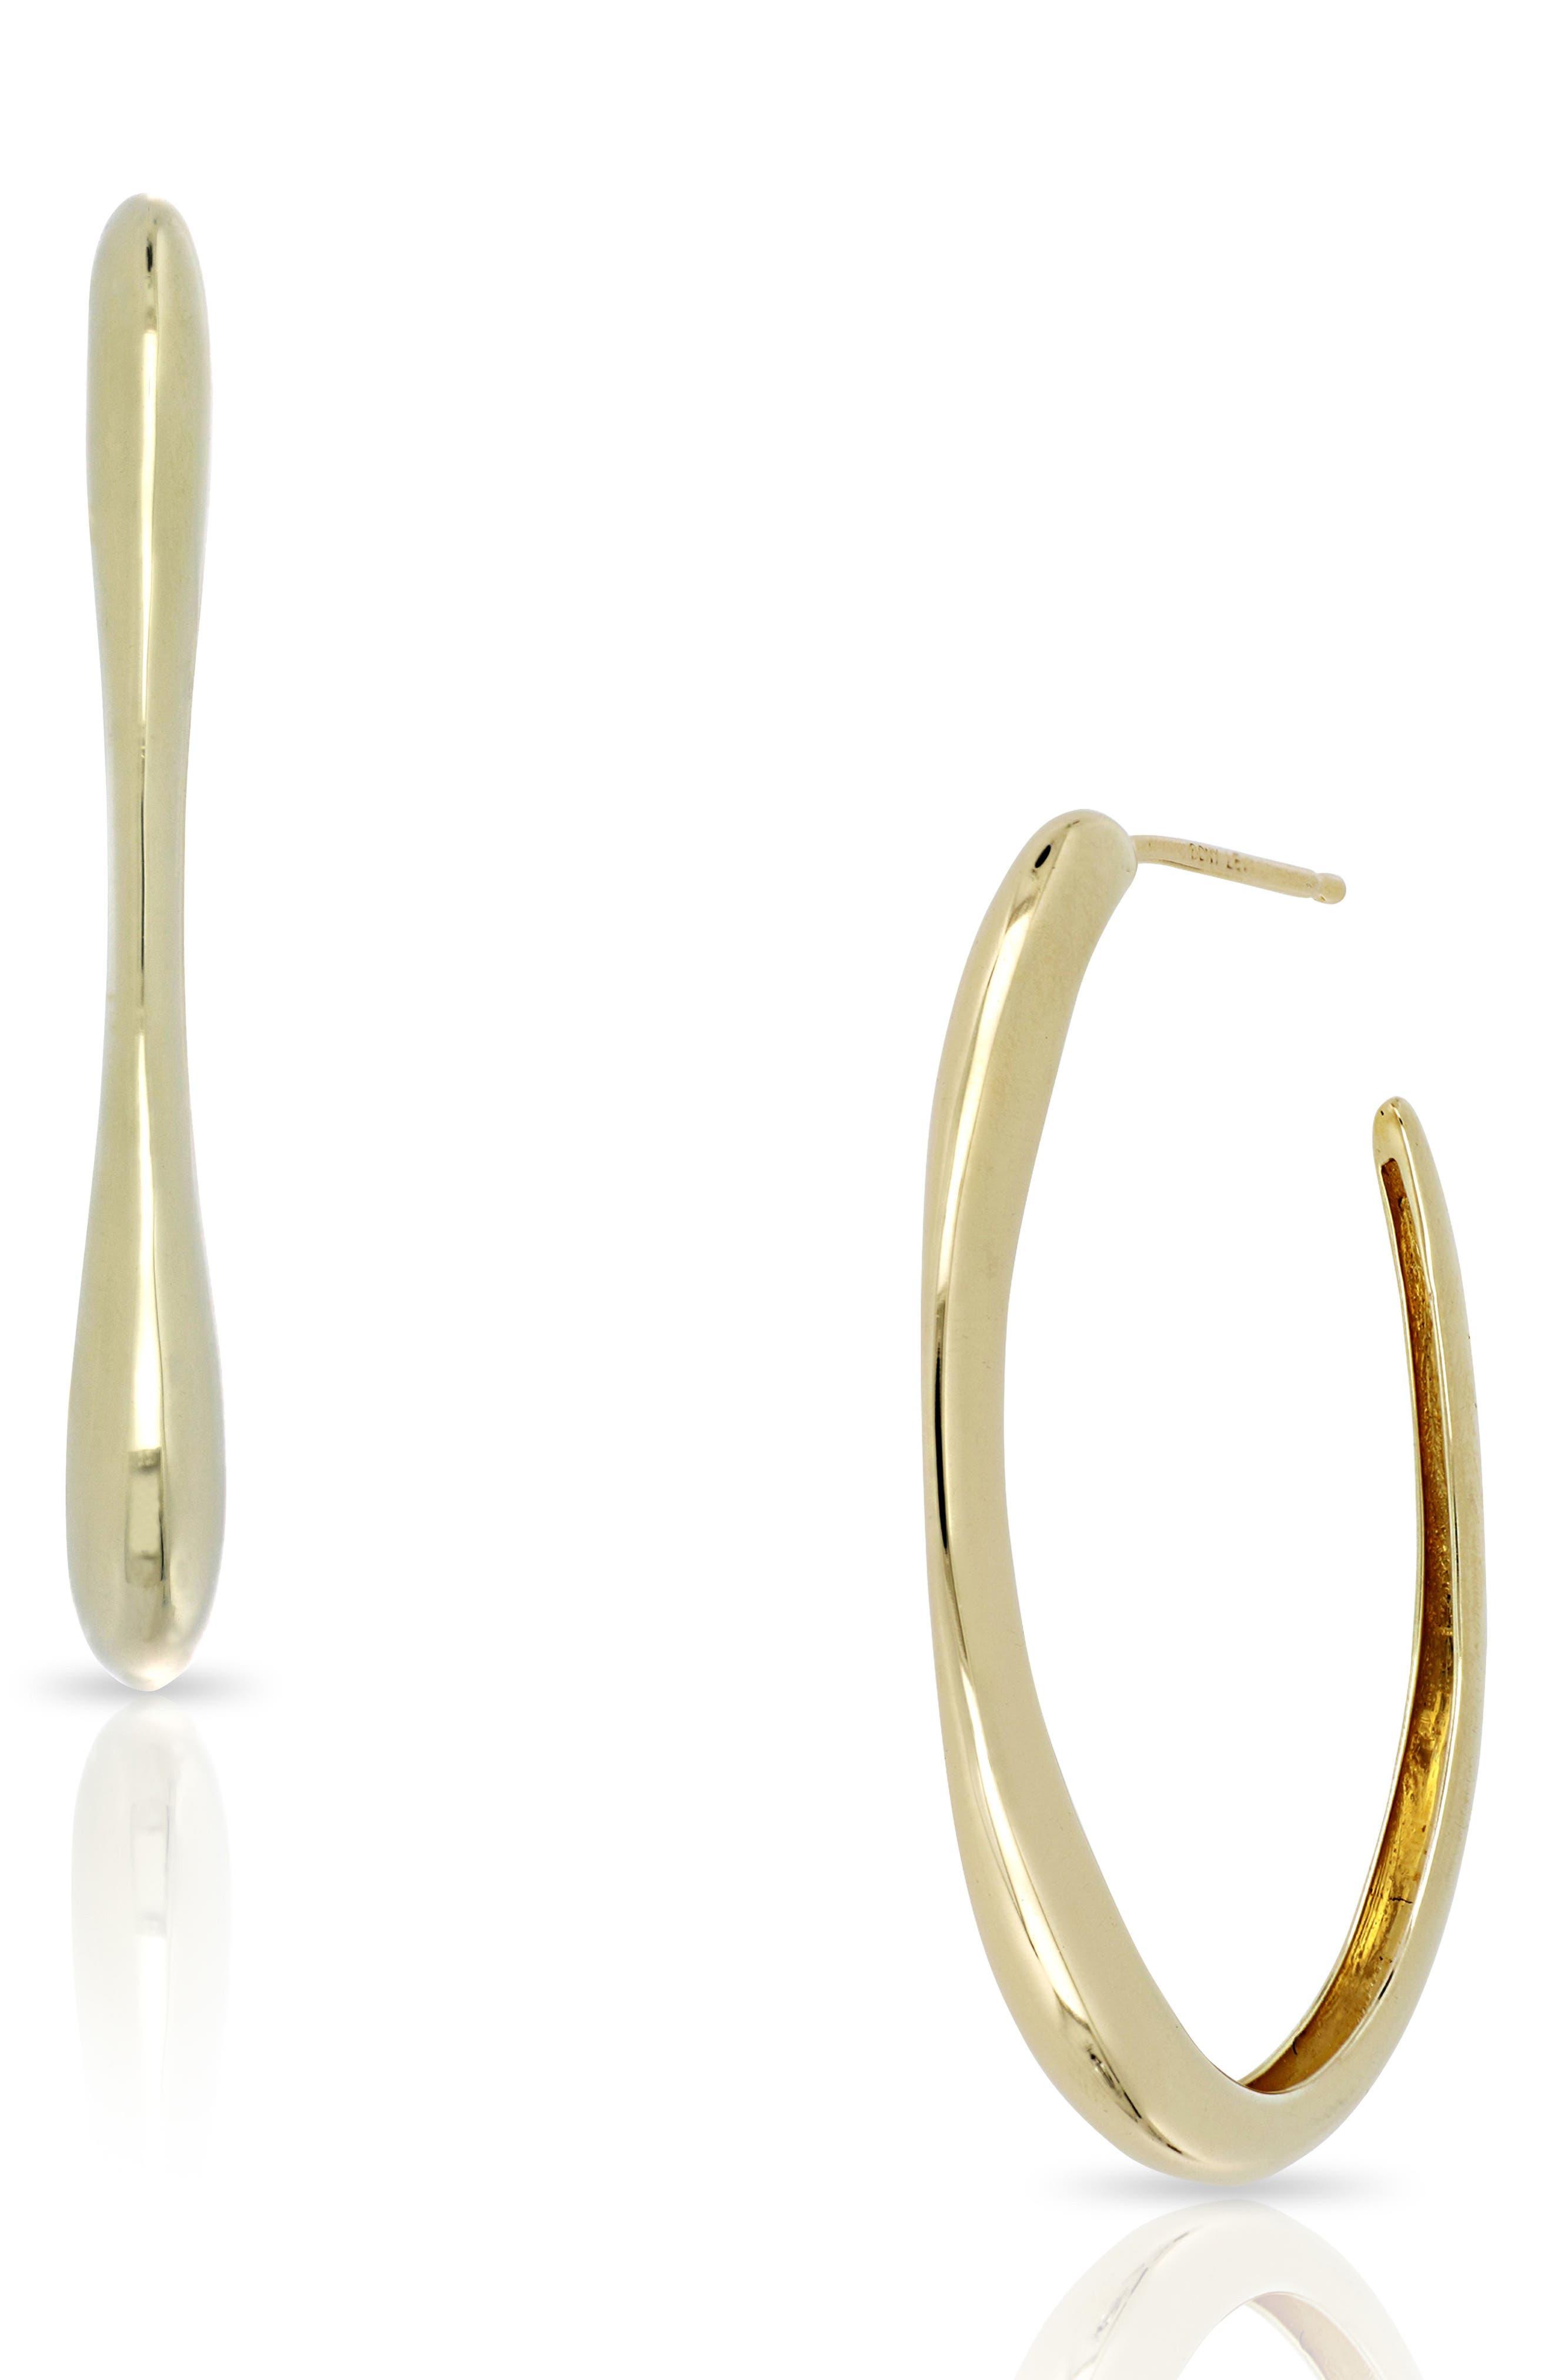 Ofira Oval Hoop Earrings,                         Main,                         color, Yellow Gold